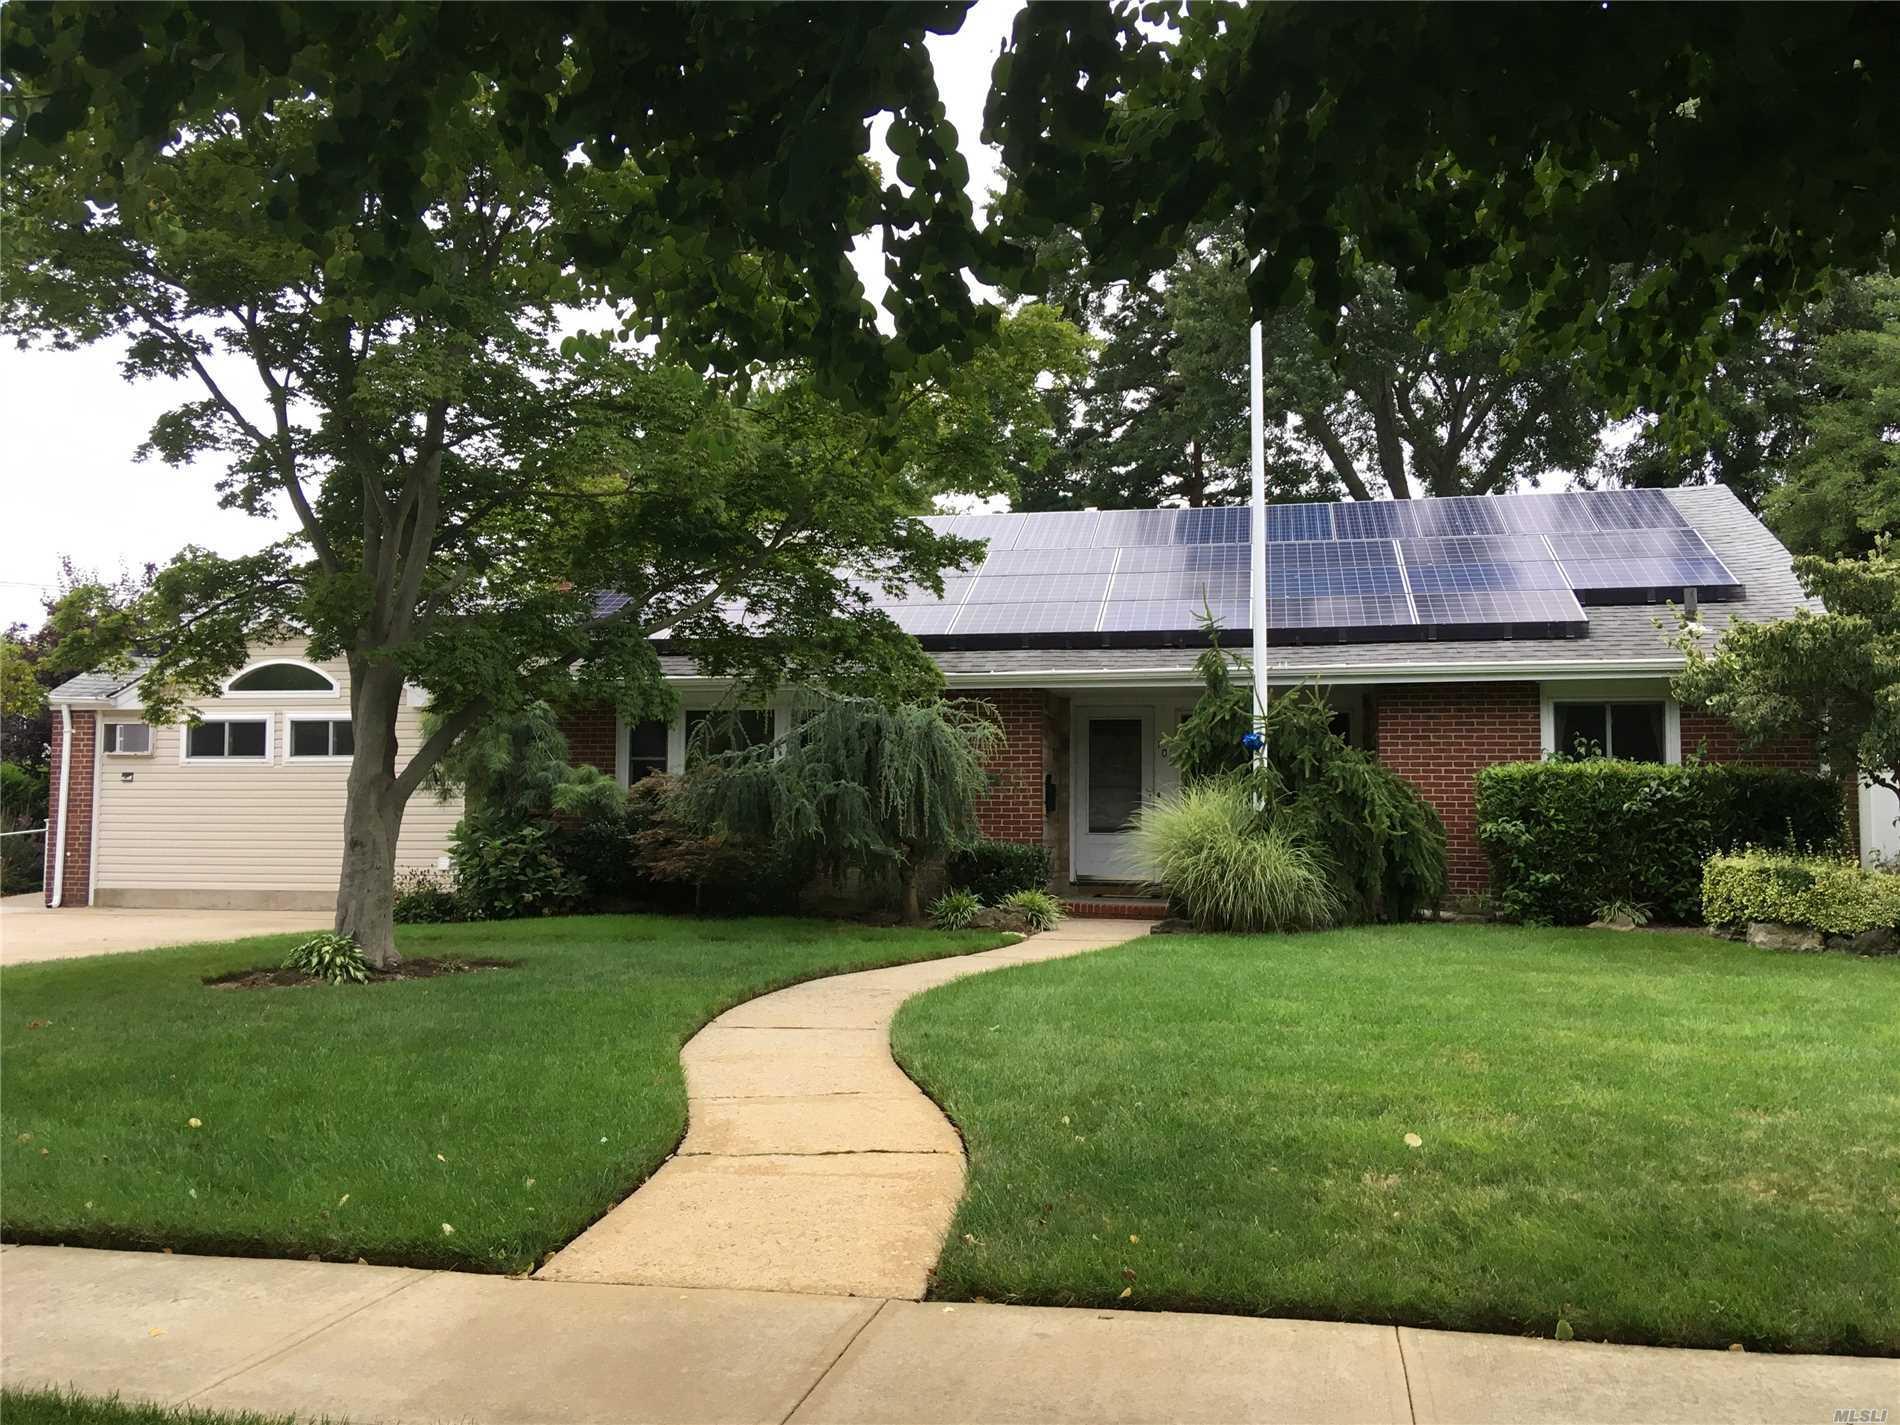 Photo of home for sale at 105 Unqua Rd, Massapequa NY